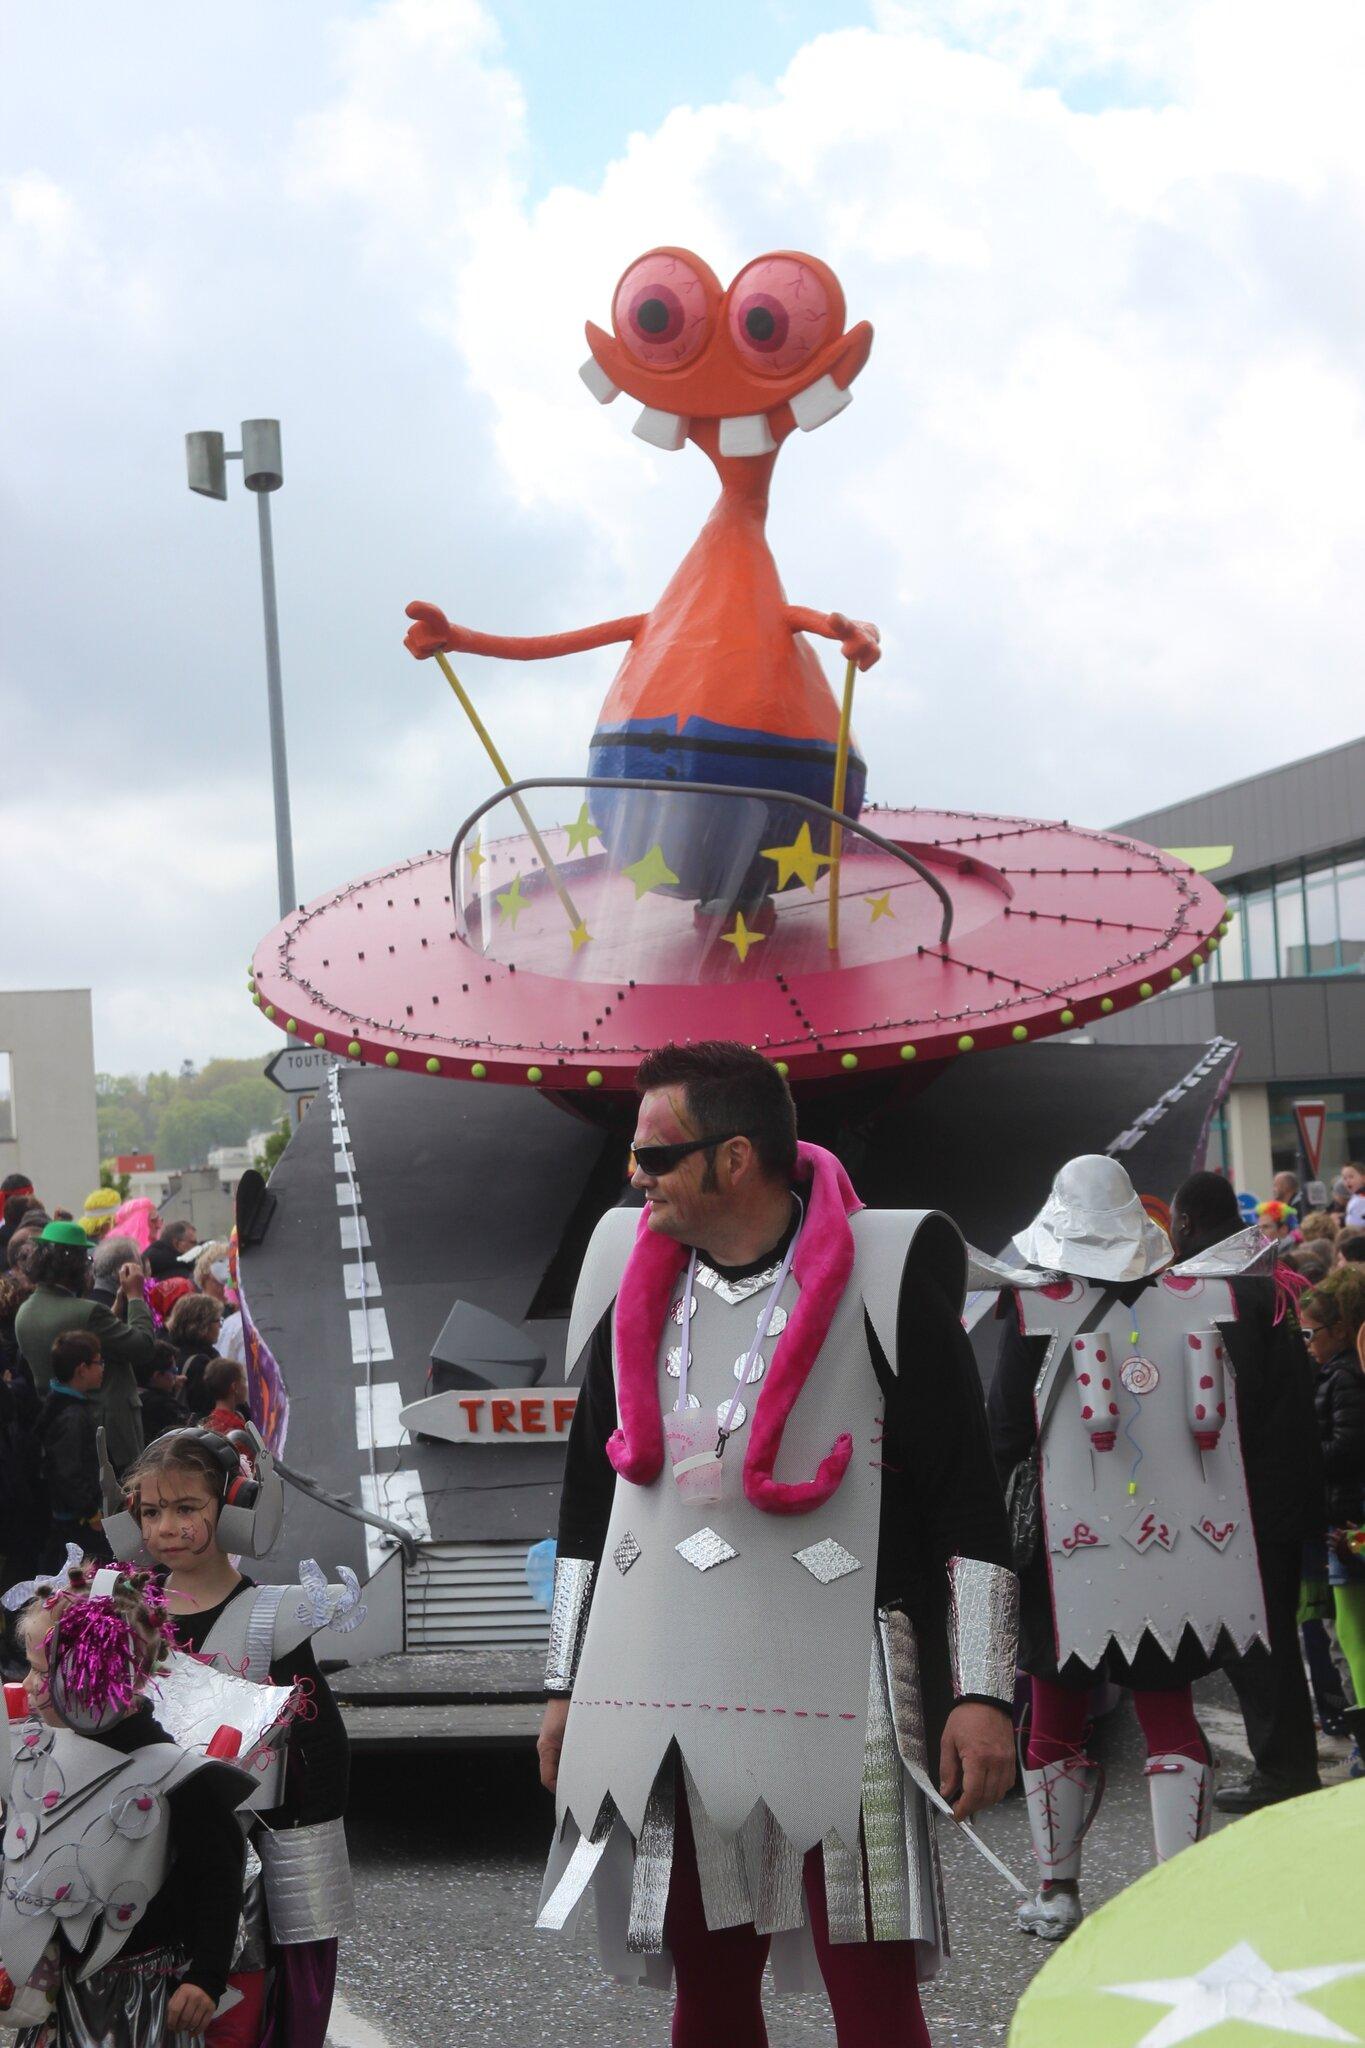 carnaval de landerneau 2014 112